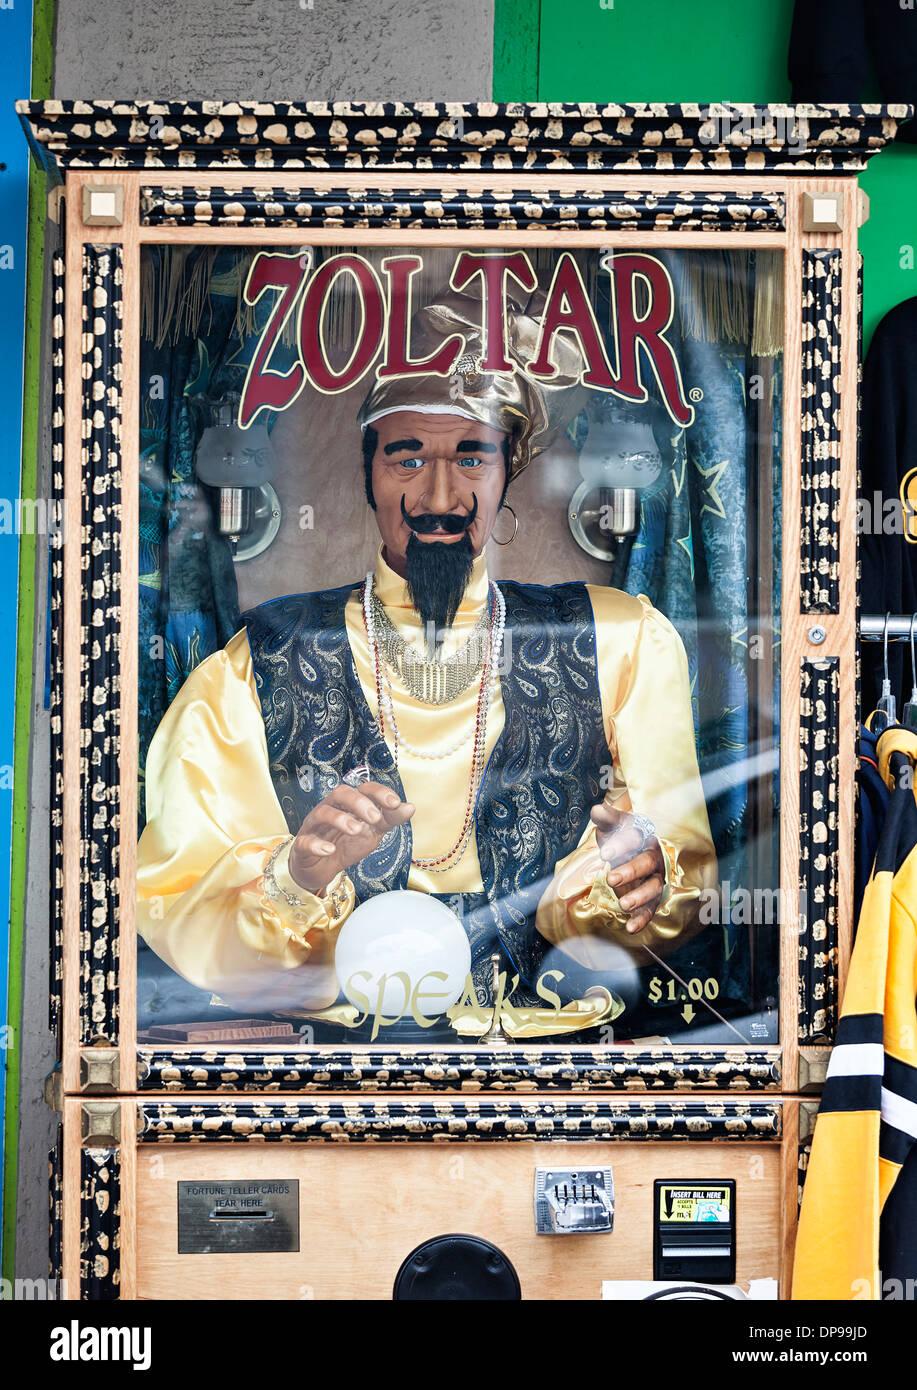 Zoltar, fortune teller machine - Stock Image